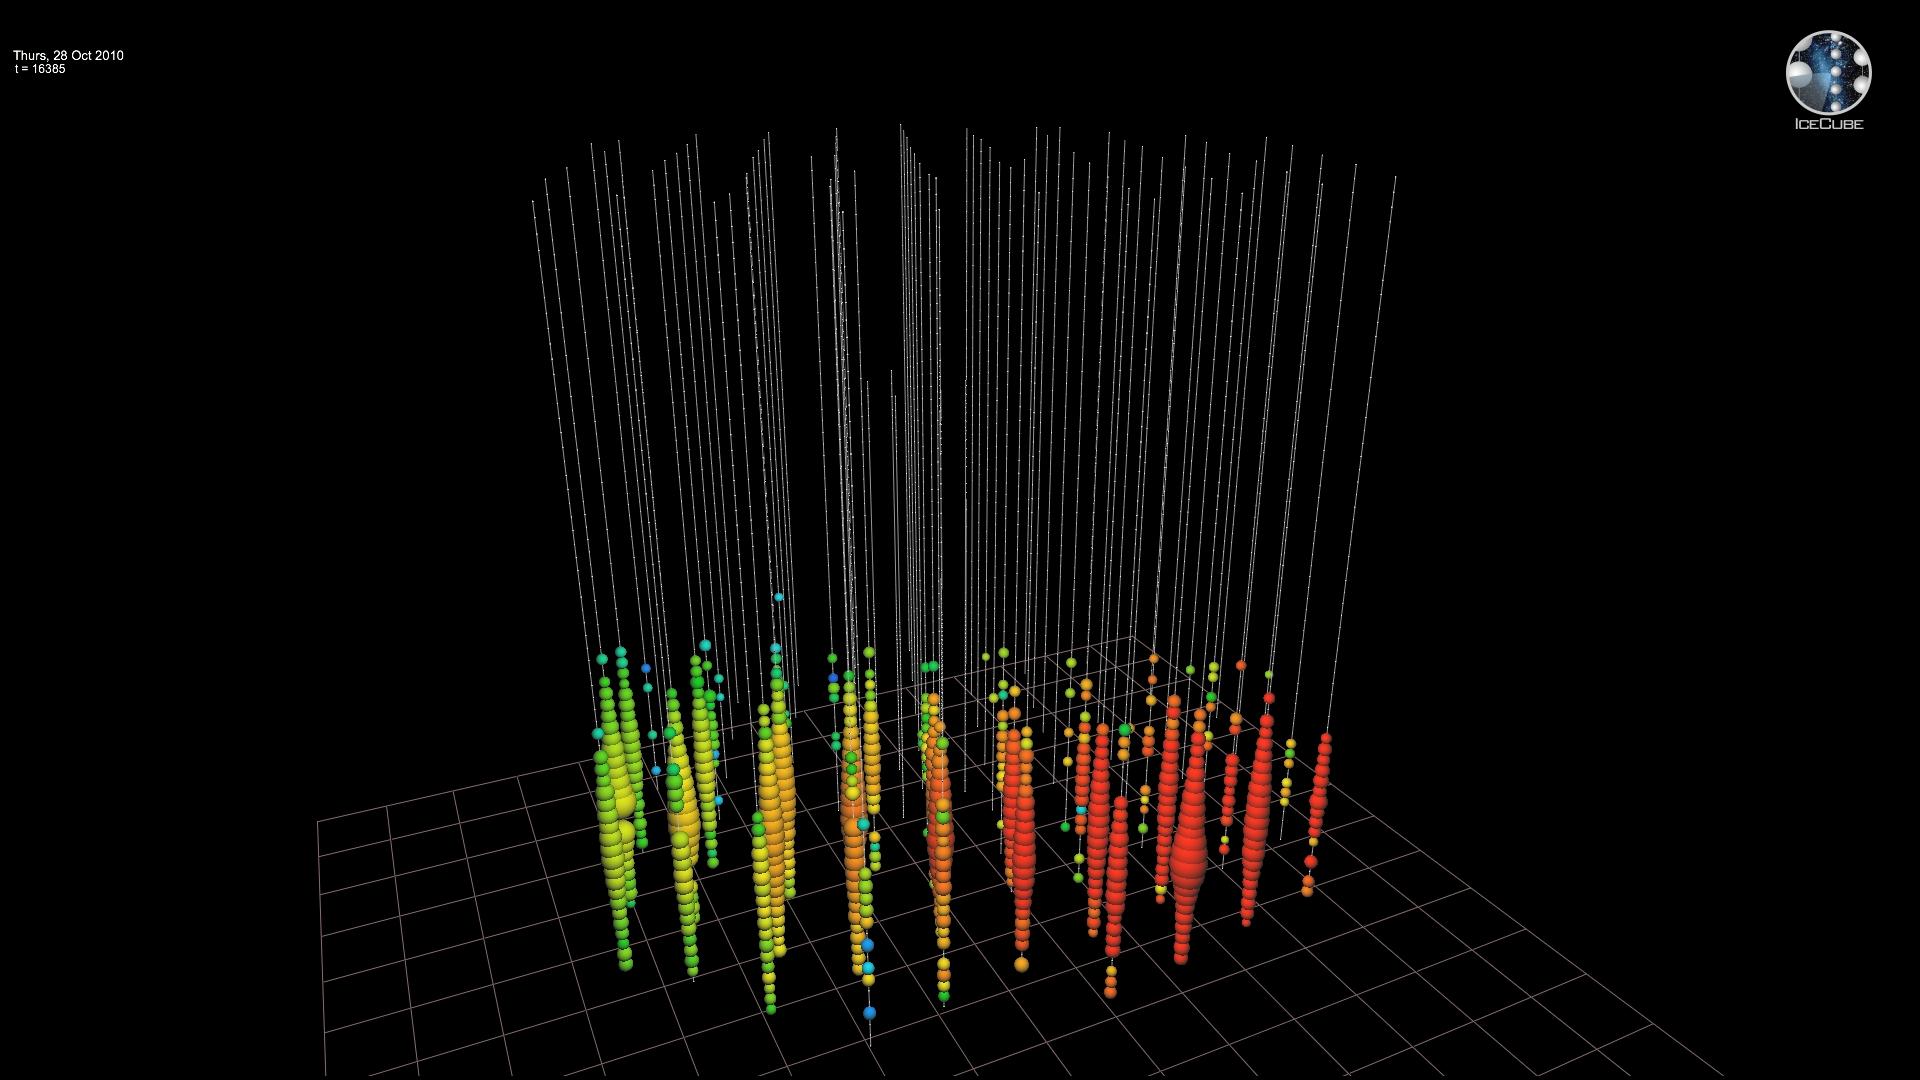 Video, IceCube Event ID 116807,9493609. Most probable neutrino energy: 880 TeV, October 28, 2010